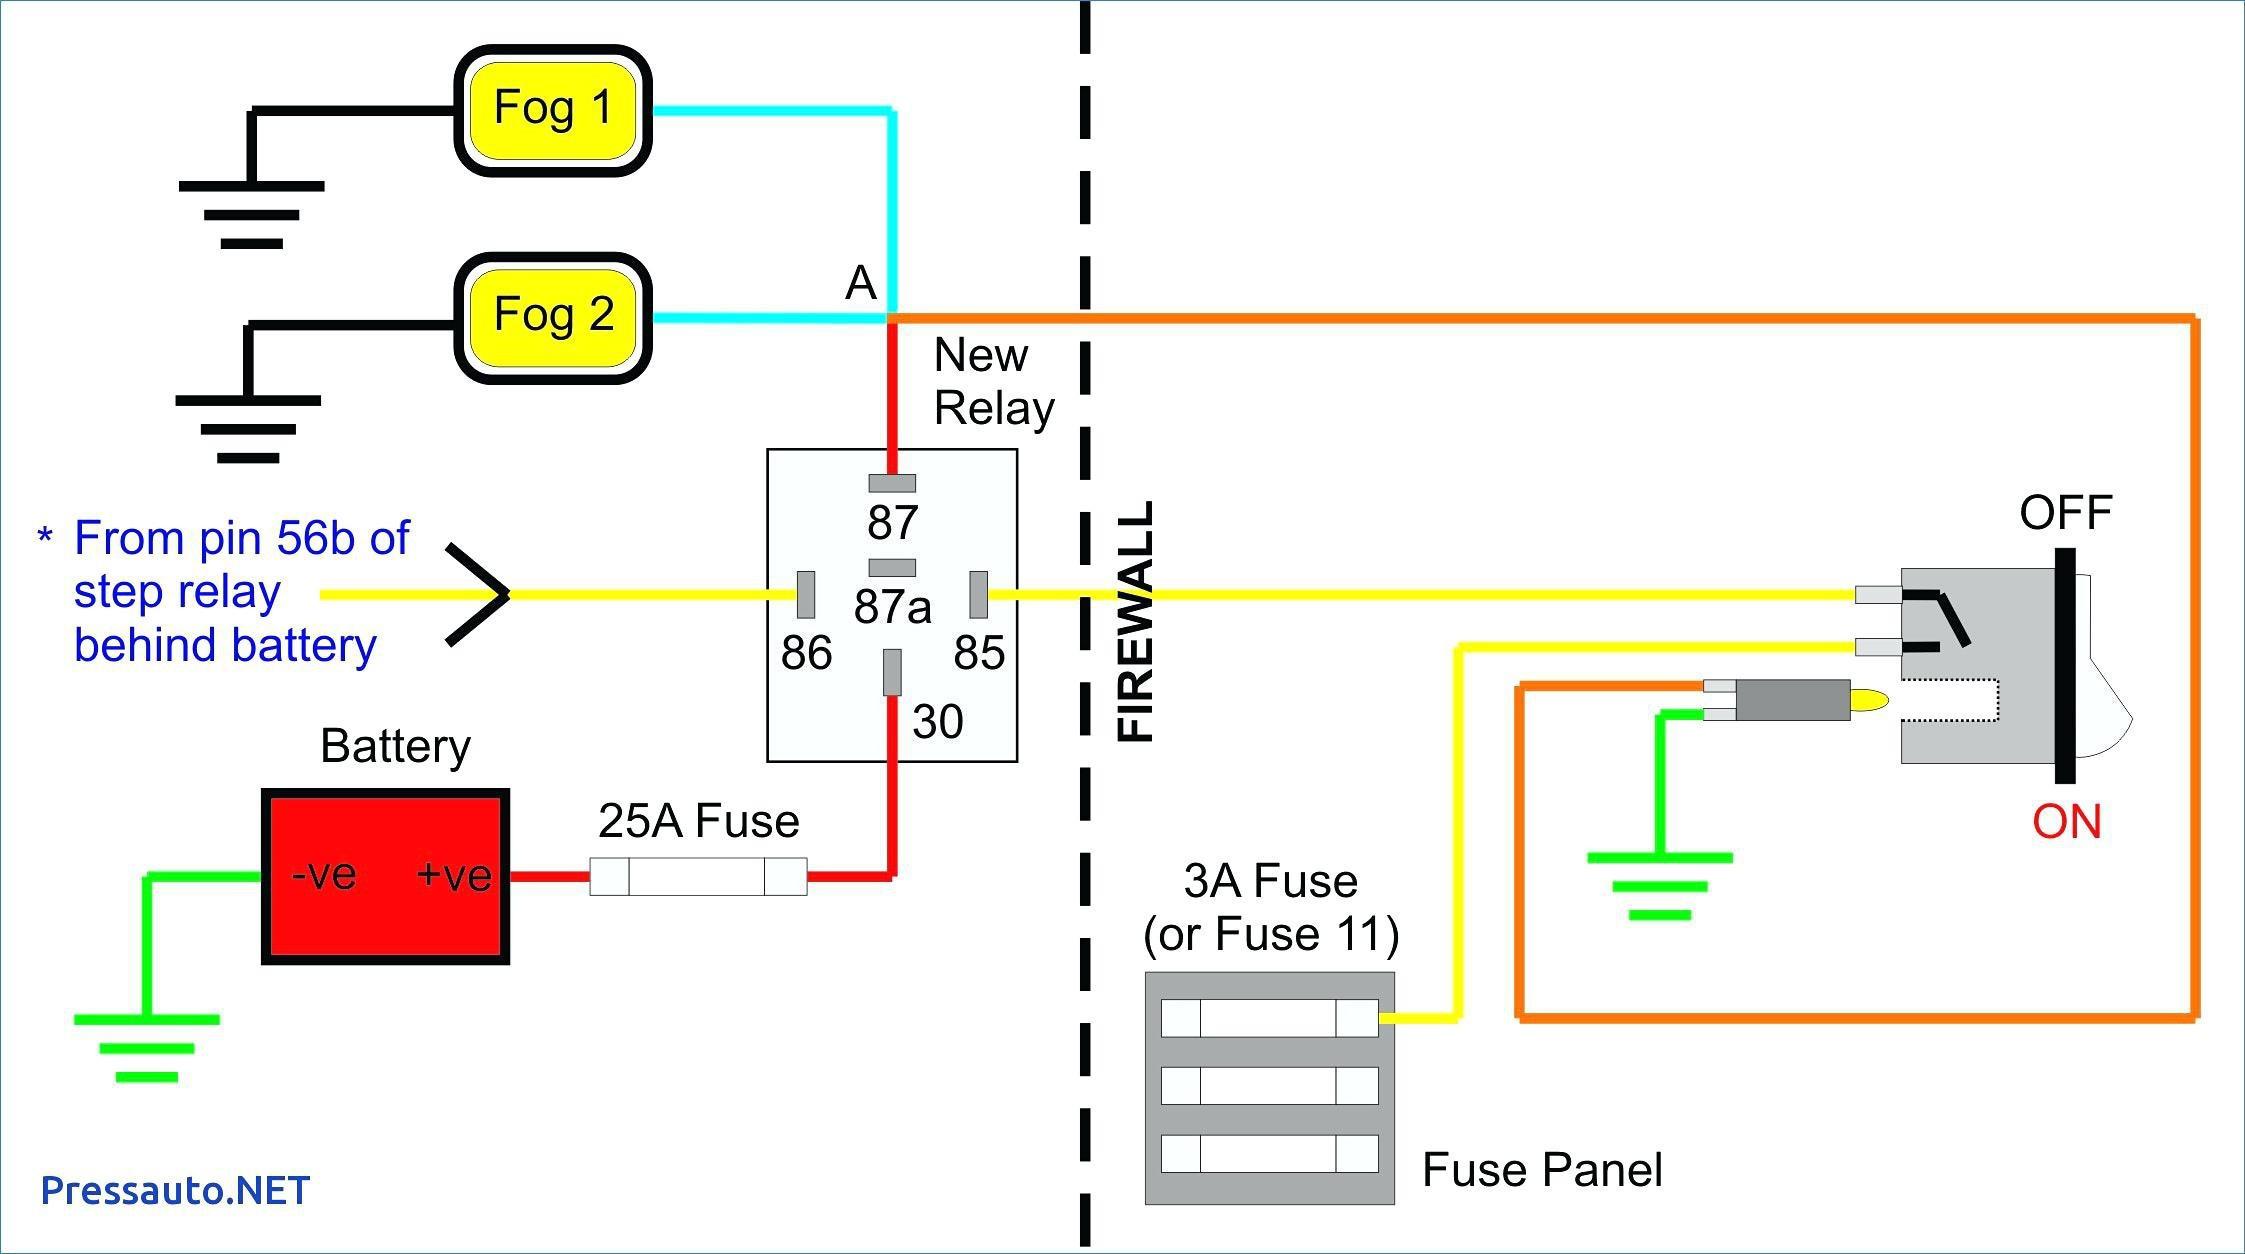 Fog Light Wiring Diagram - Wiring Diagram Data - Fog Light Wiring Diagram